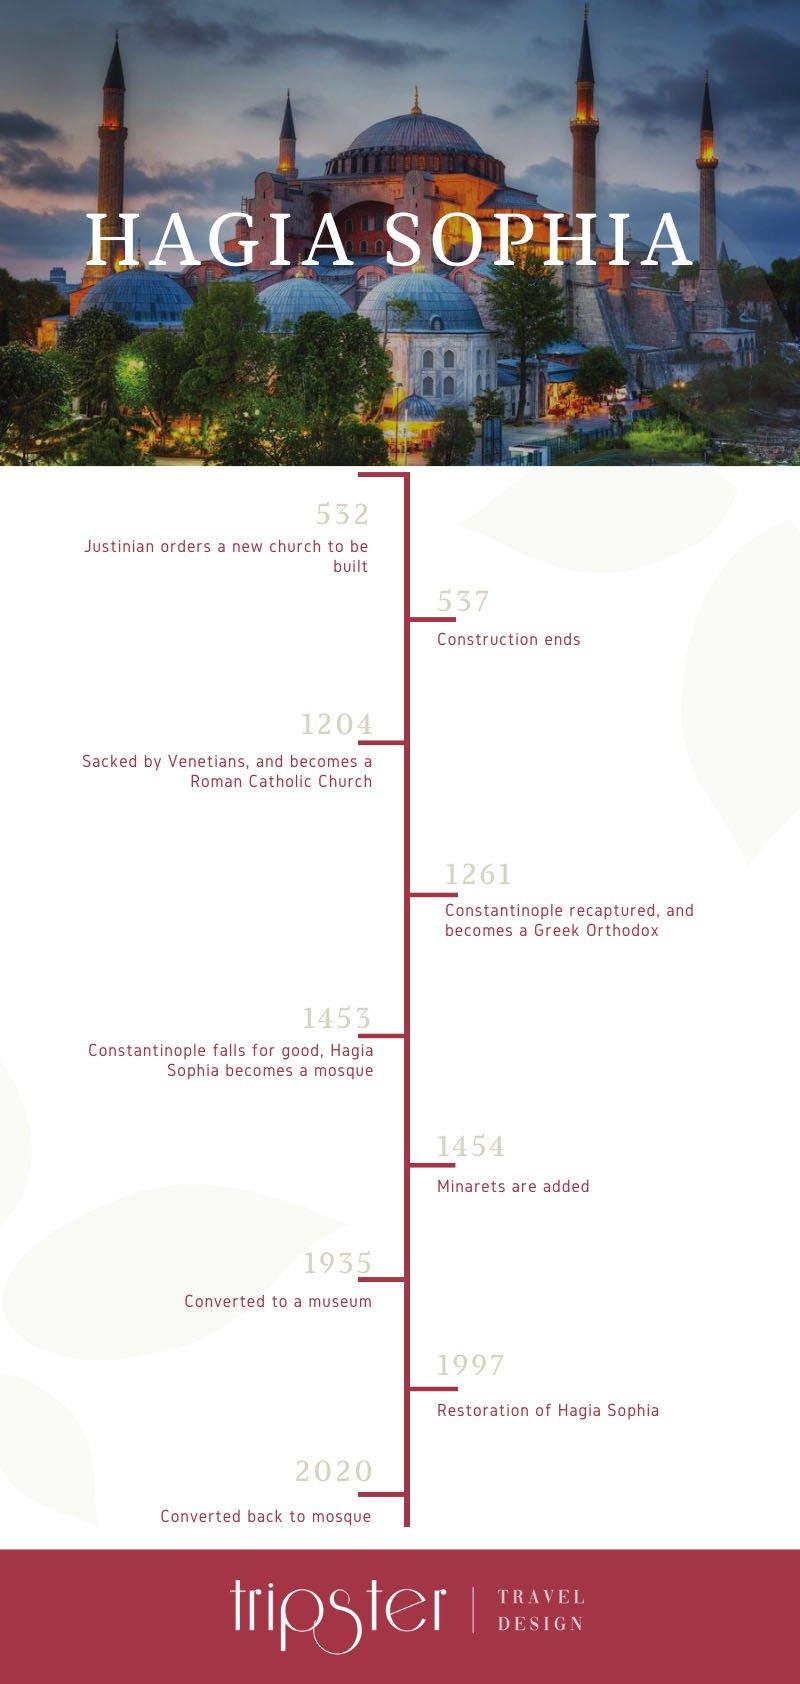 hagia-sophia-timeline-infographic-min